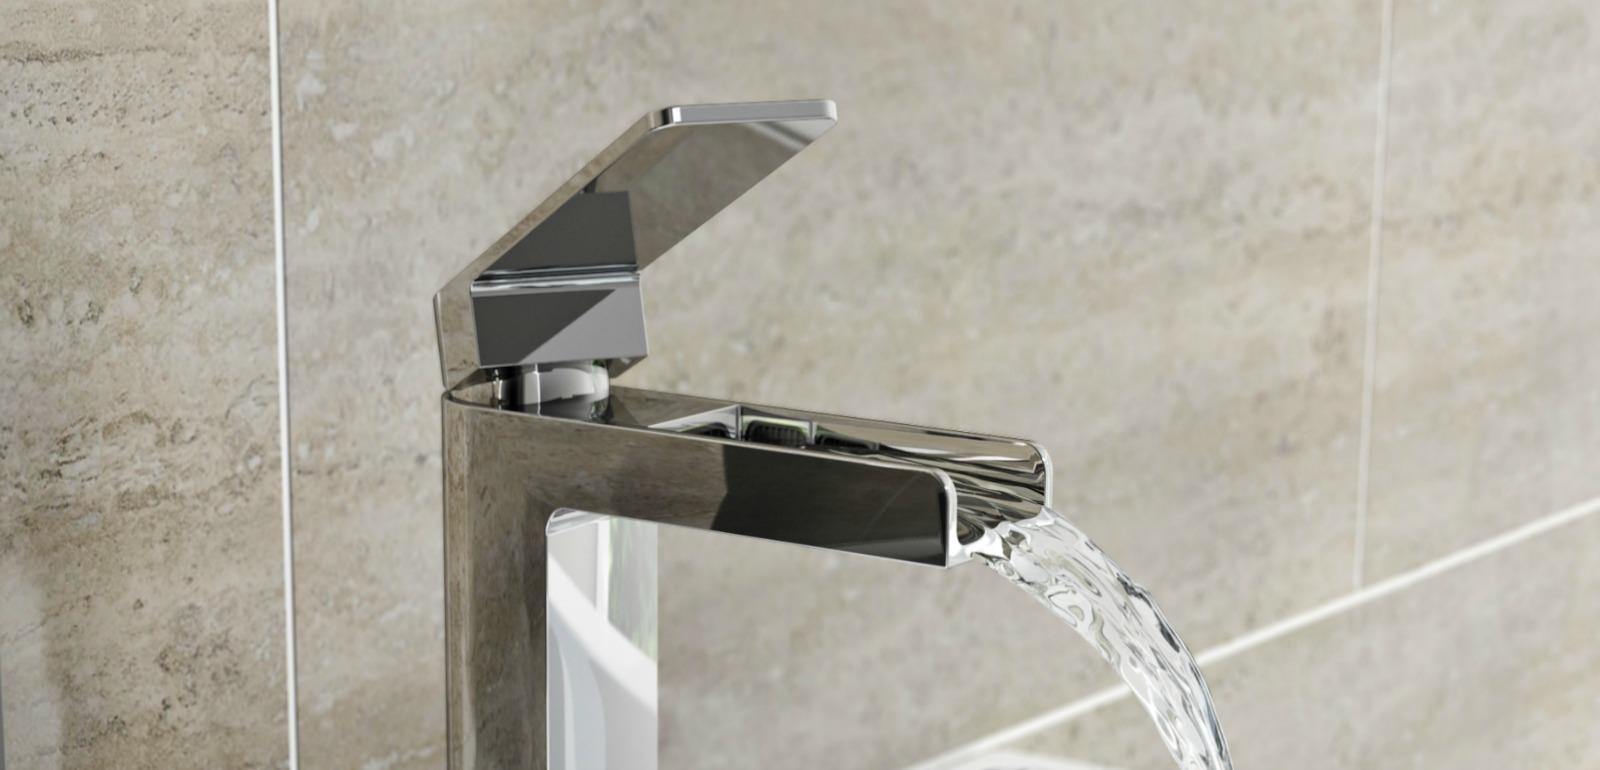 waterfall-basin-mixer-tap-buying-guide.jpg